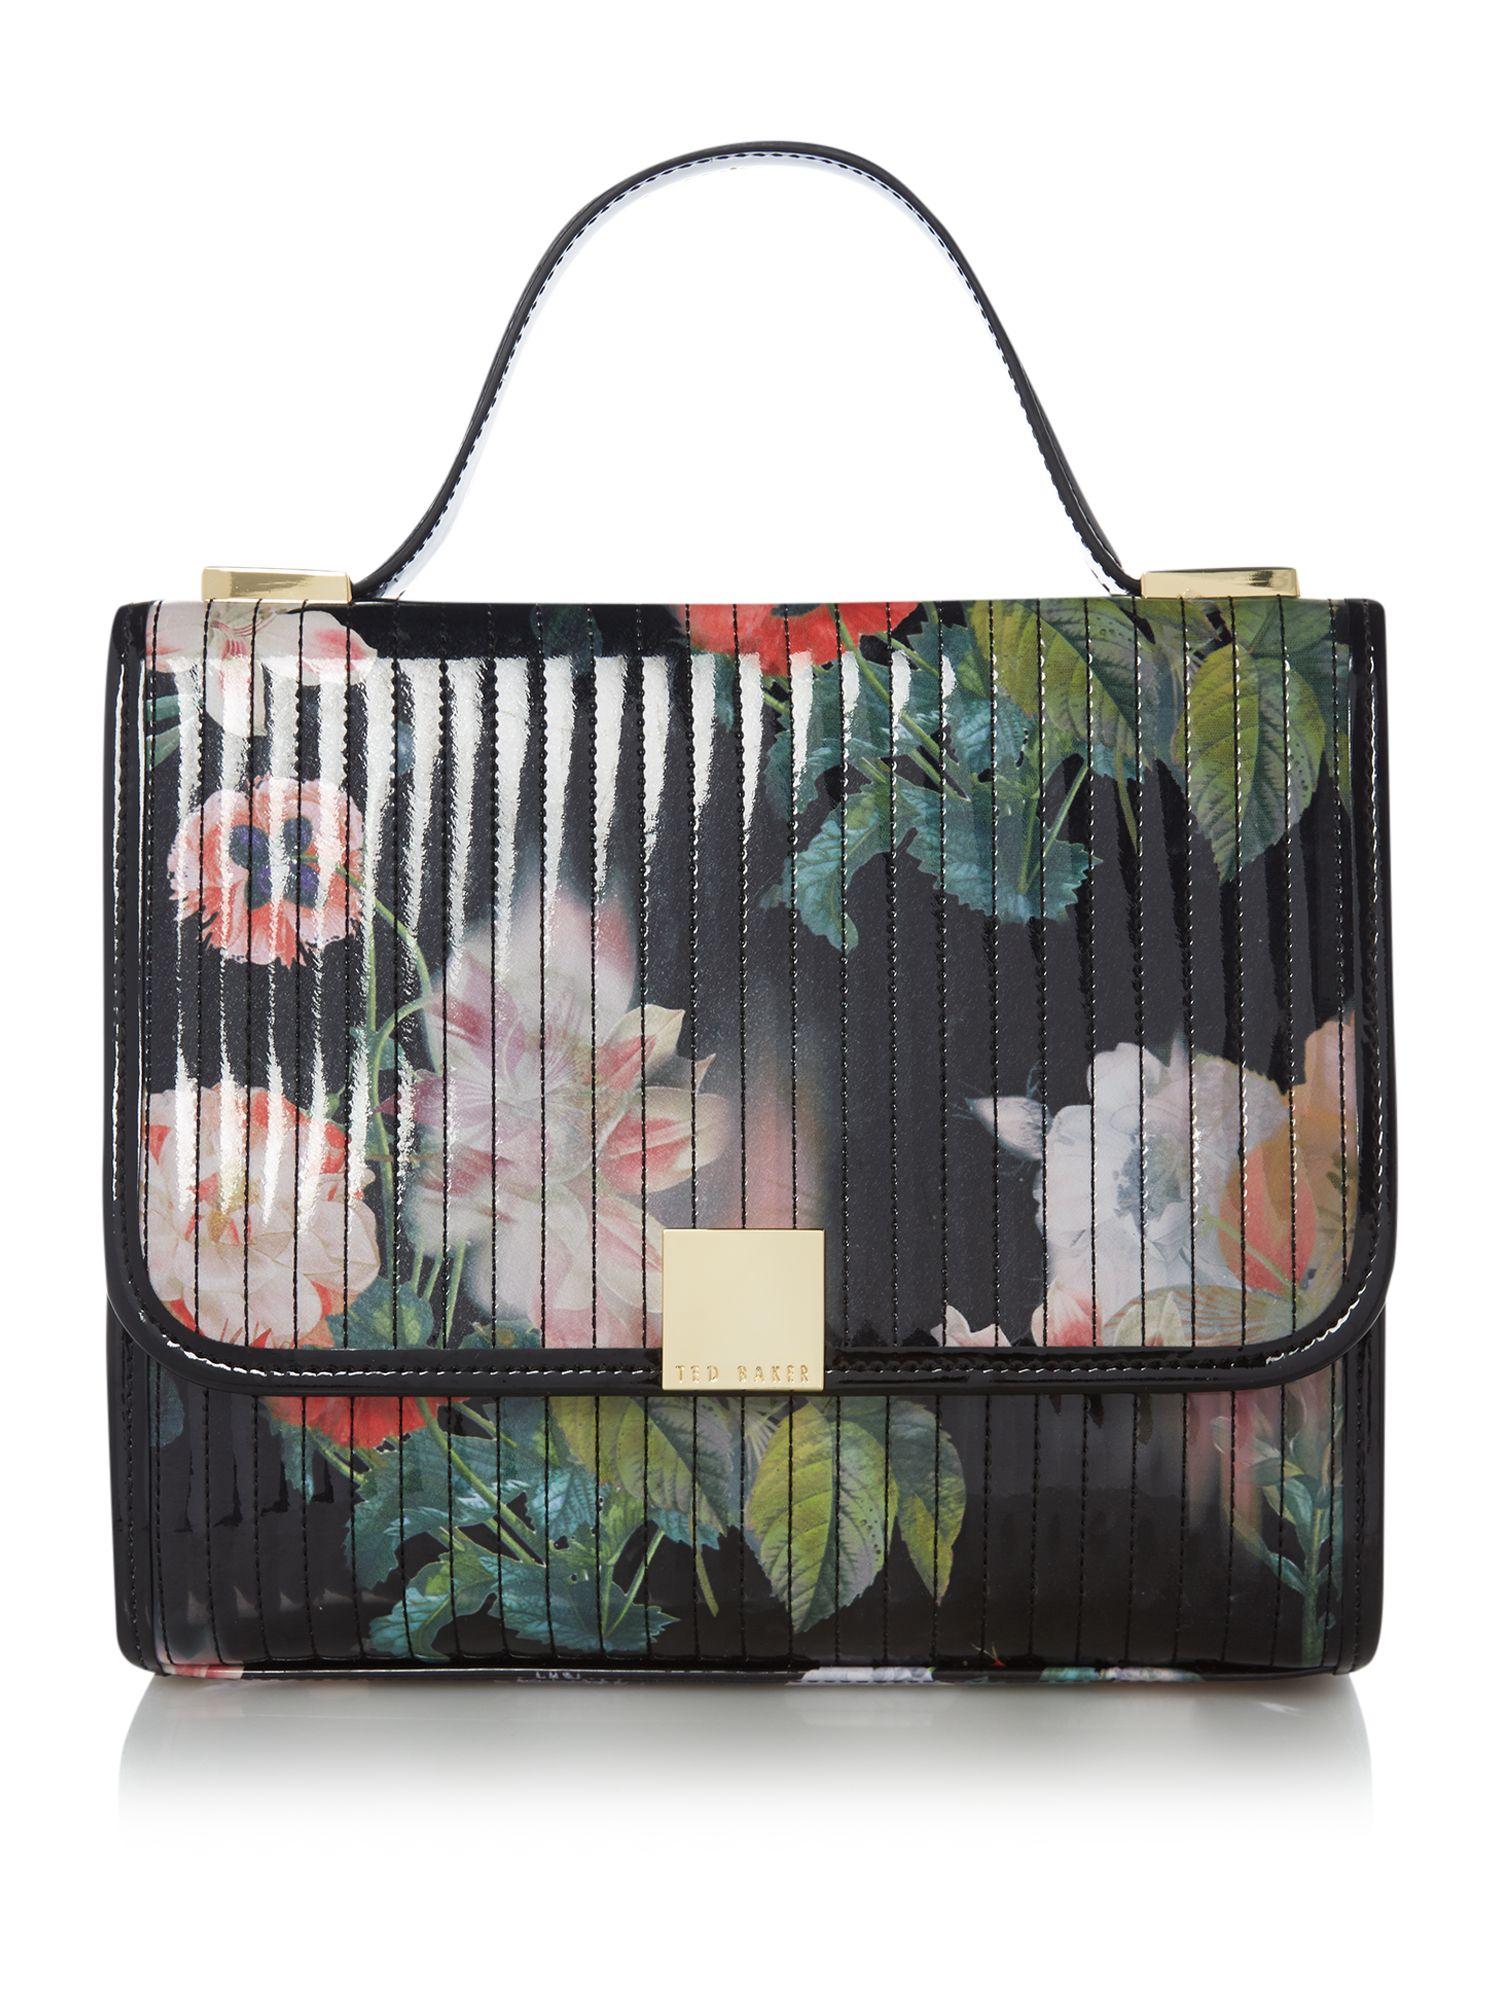 Ted Baker Black Floral Print Quilt Cross Body Bag In Multicolor (black)   Lyst